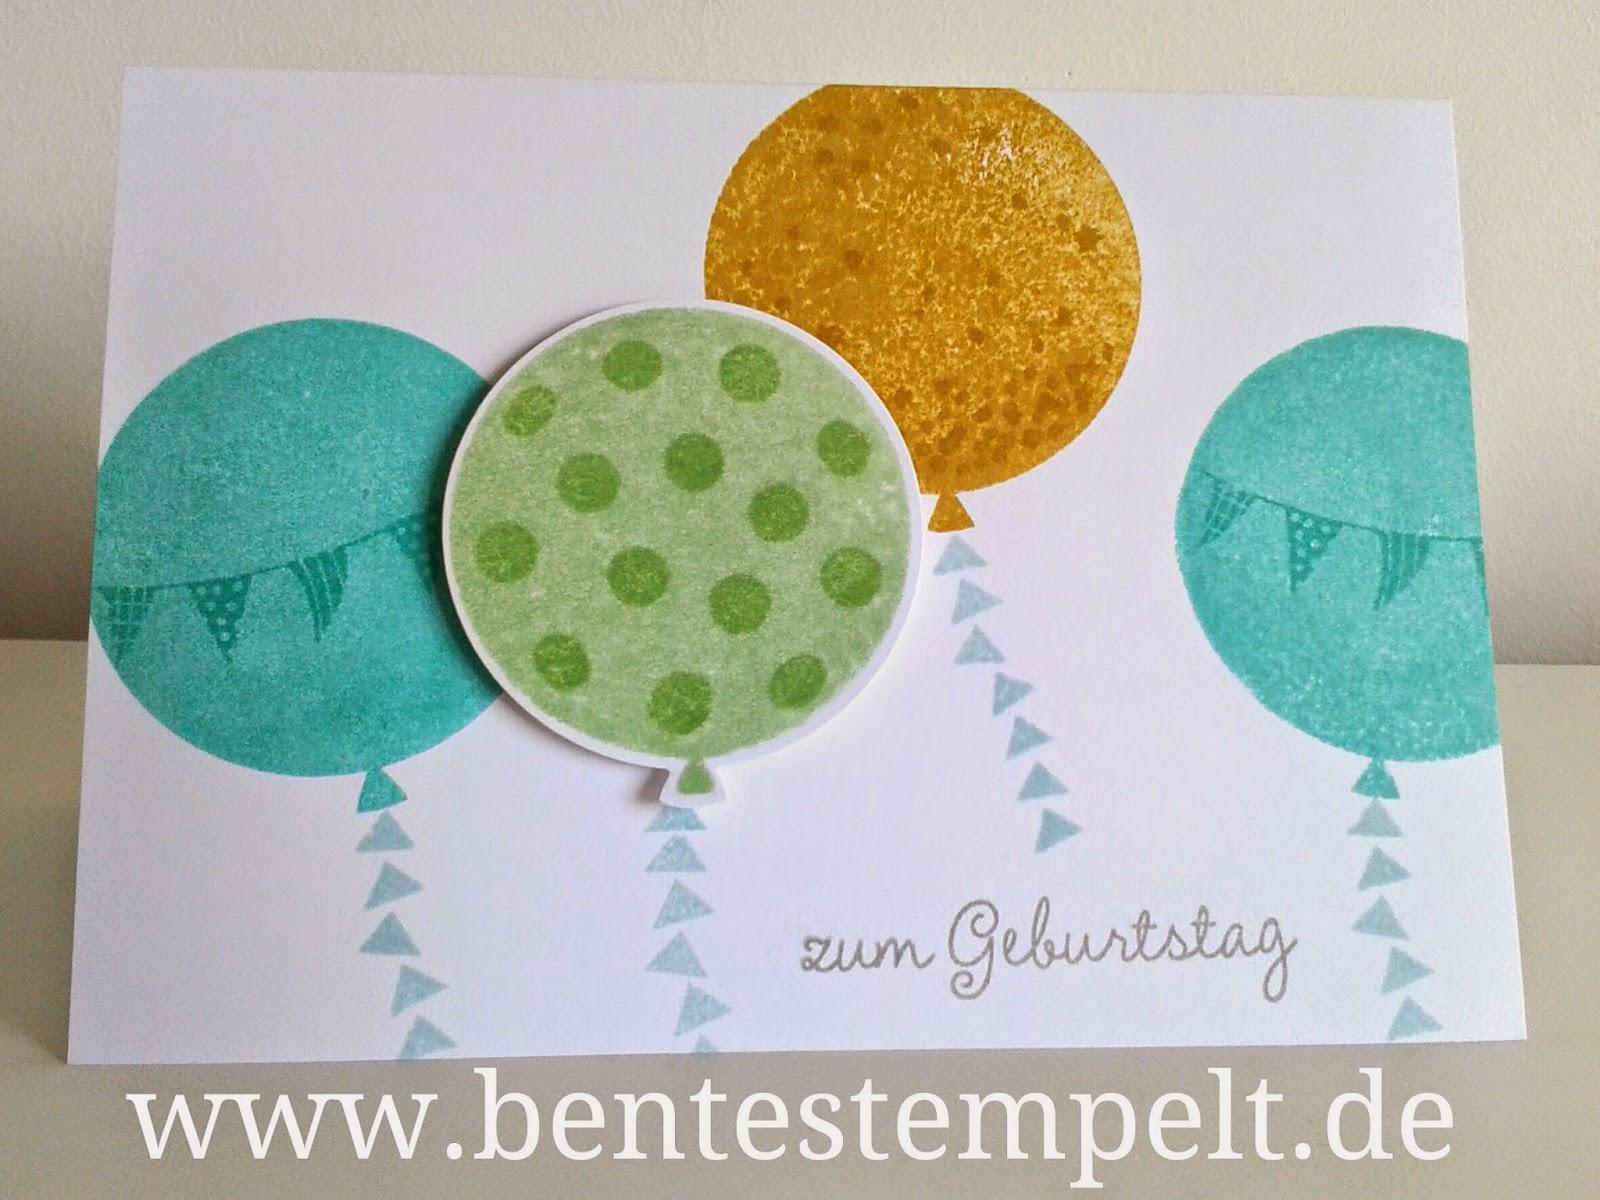 copyright www.bentestemepel.de und www.stampinup.com